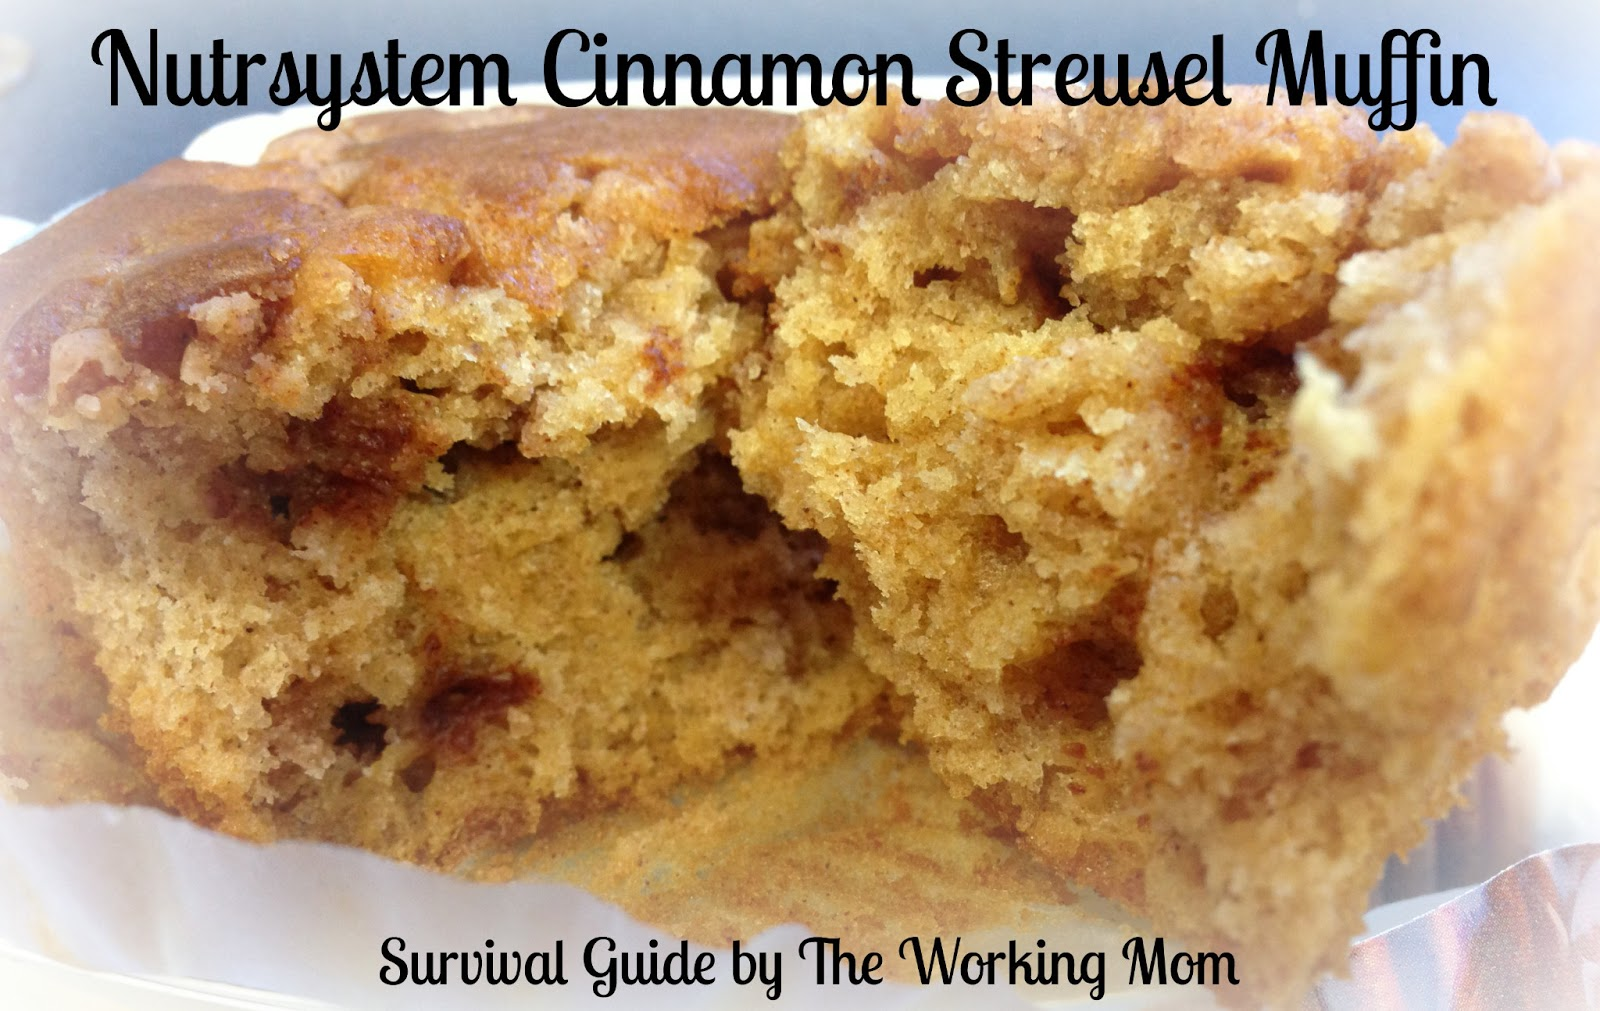 Nutrisystem blueberry muffins coupon for nutrisystem for Lean cuisine vs jenny craig food